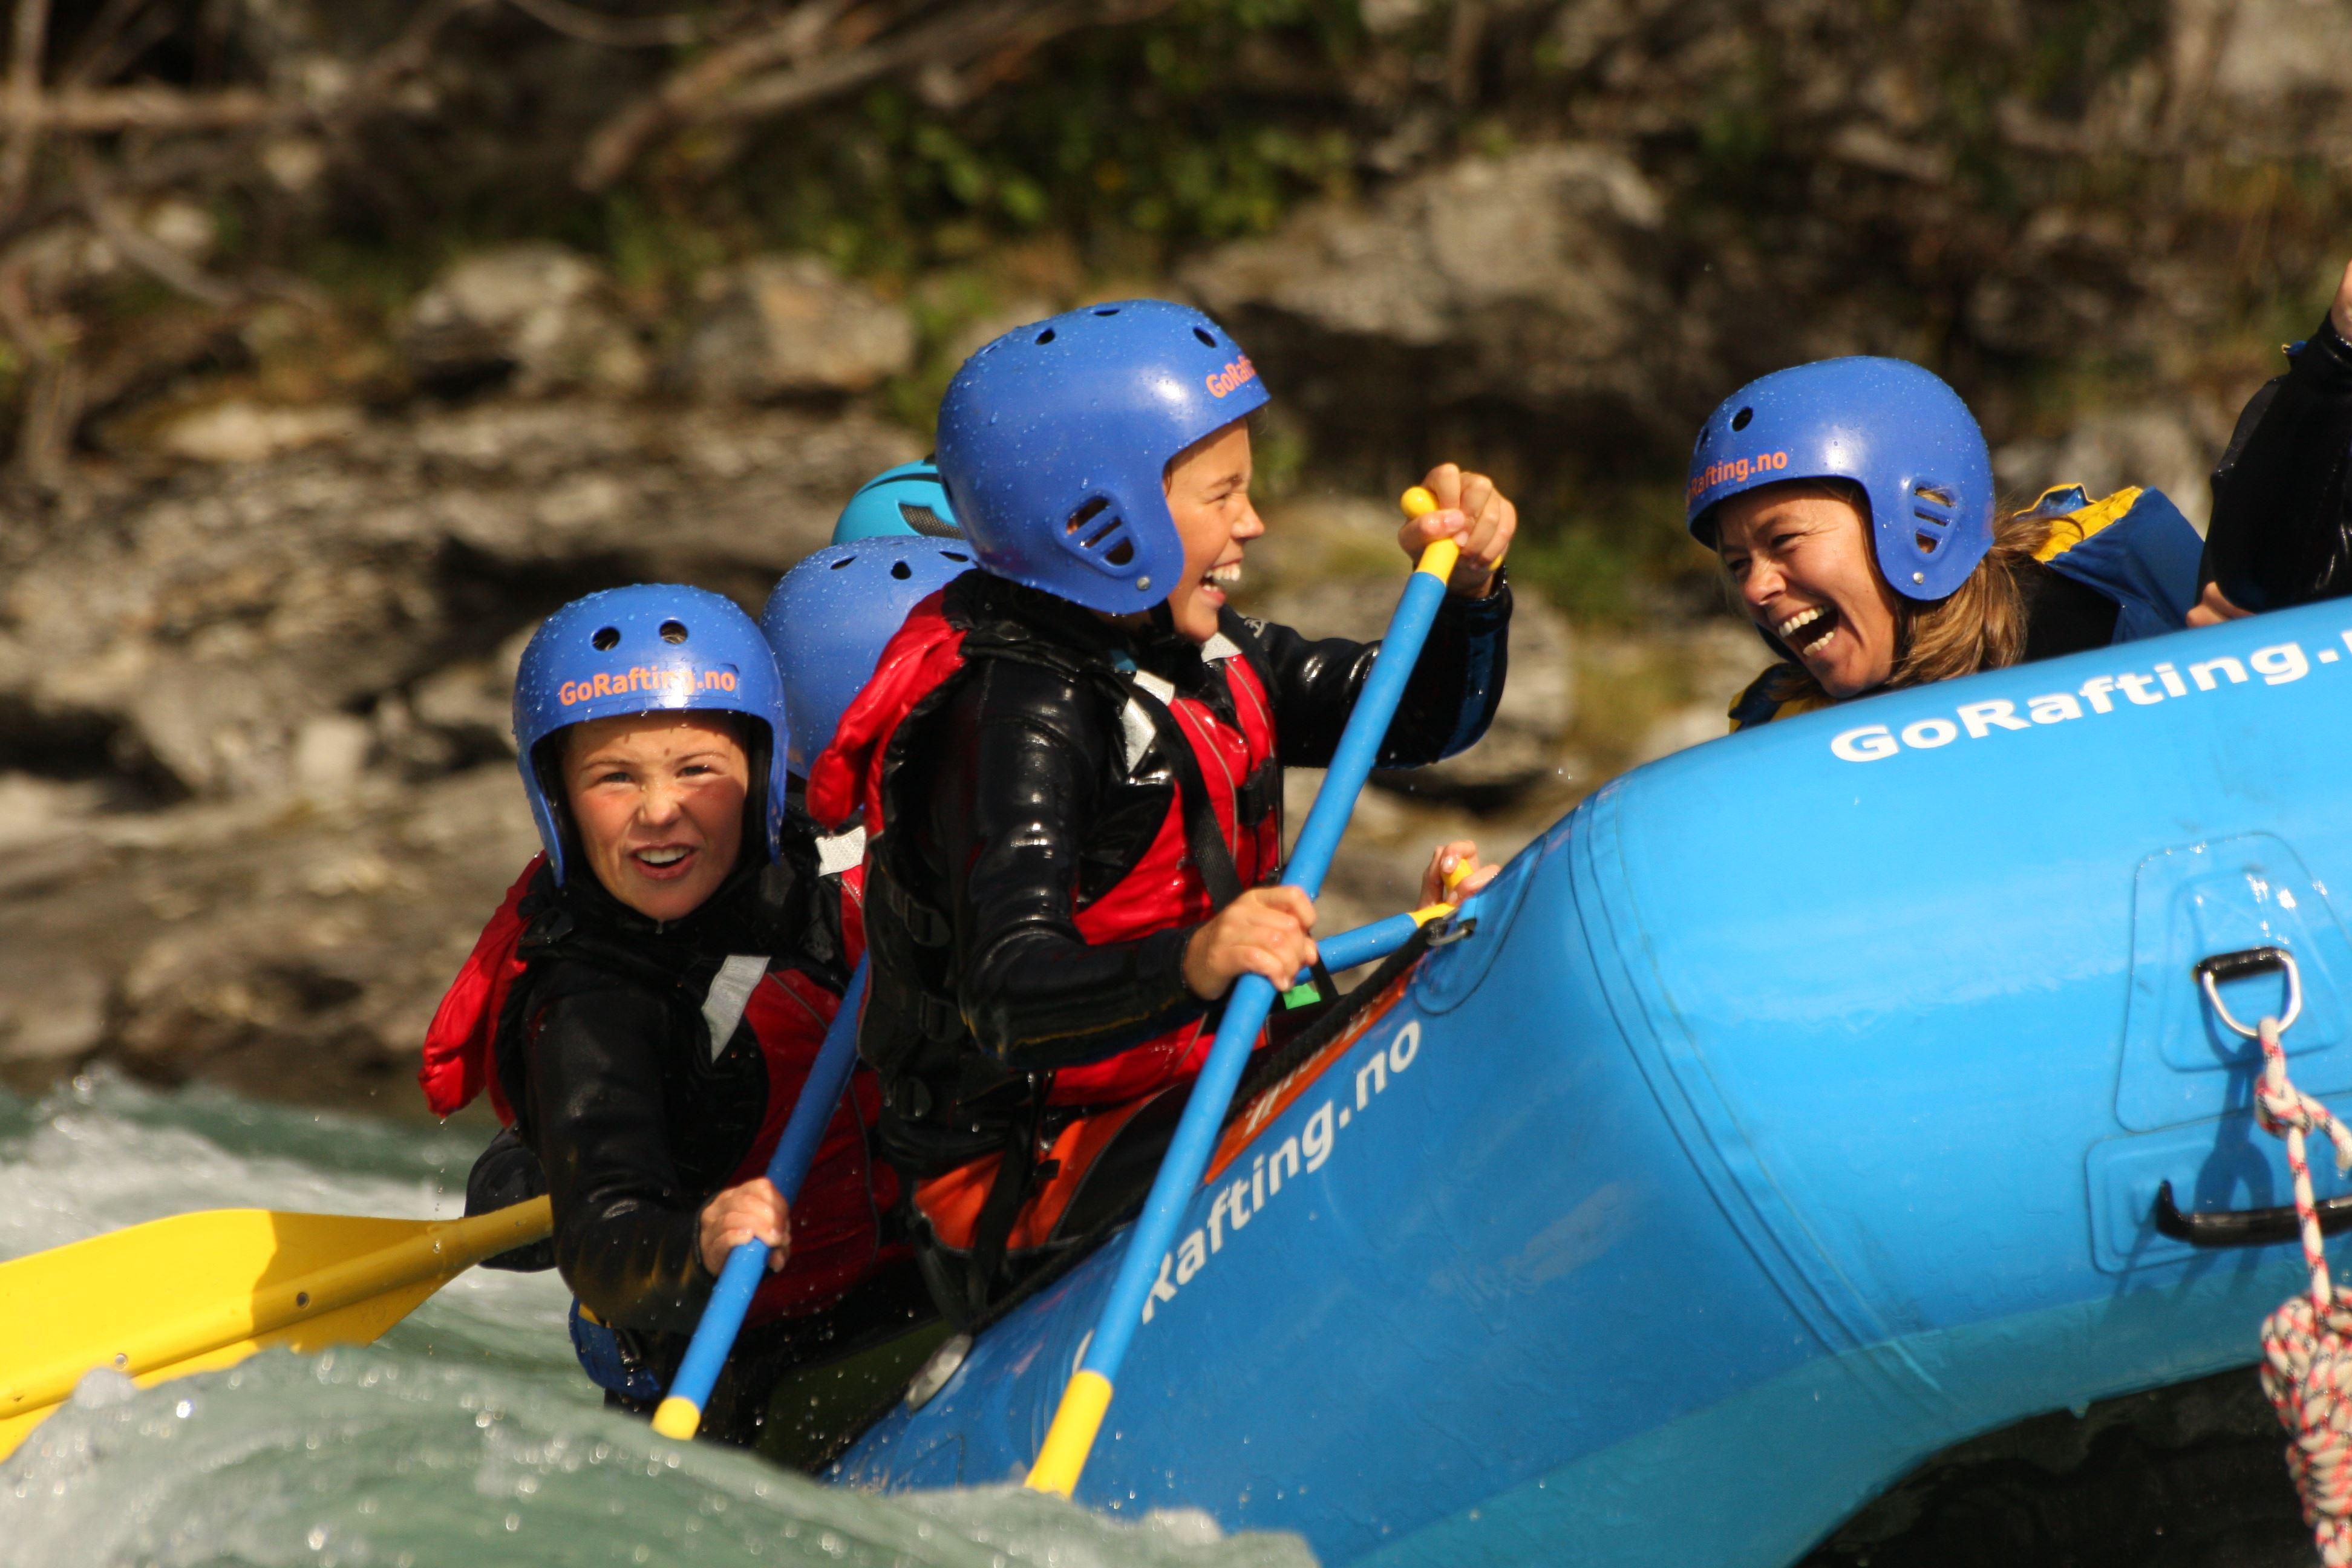 c. Family rafting